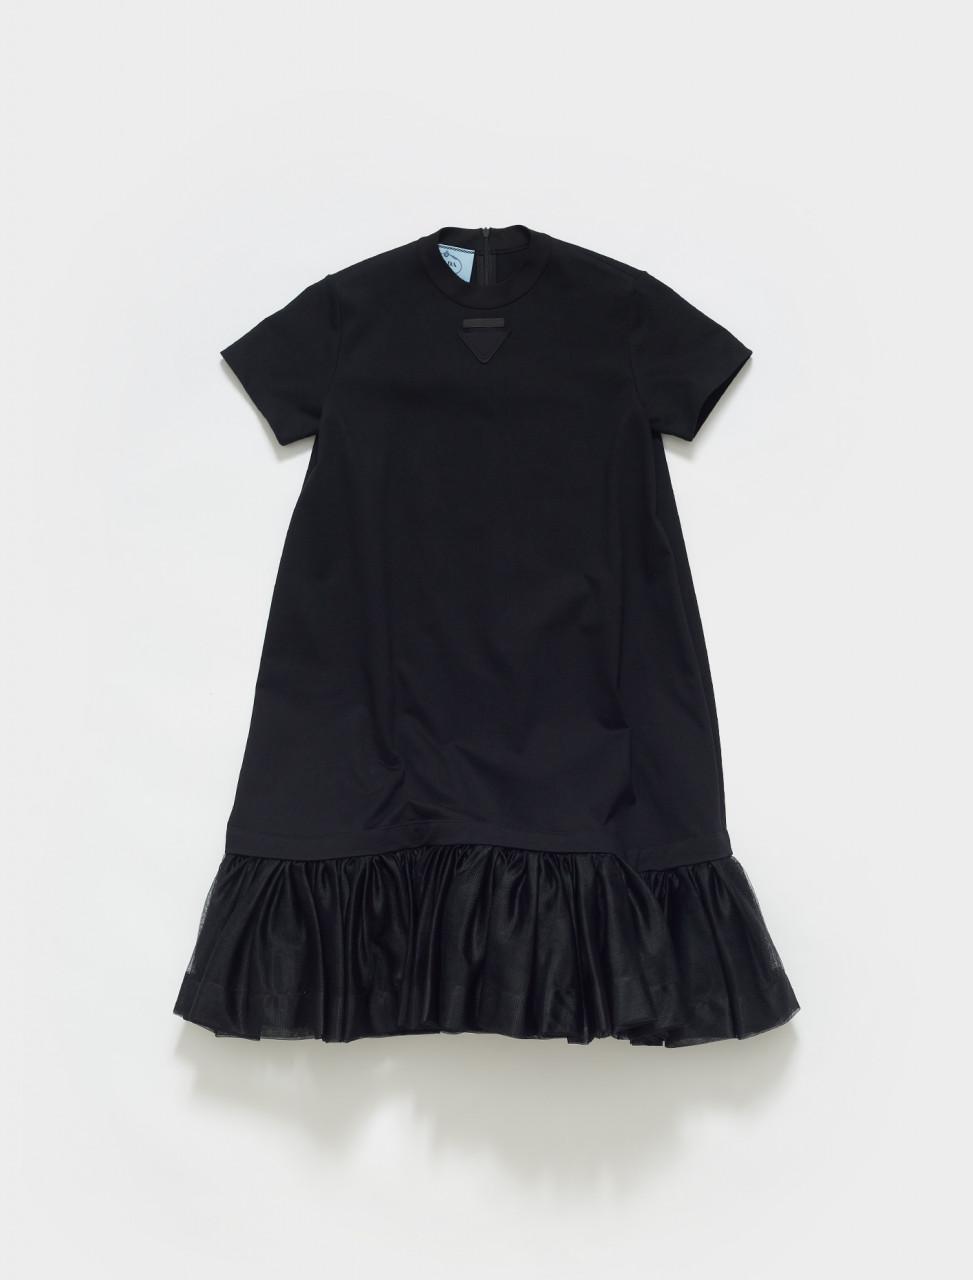 P3E14_1YYY_F0806 PRADA SHORT SLEEVED JERSEY DRESS WITH RUFFLE DETAIL IN BLACK